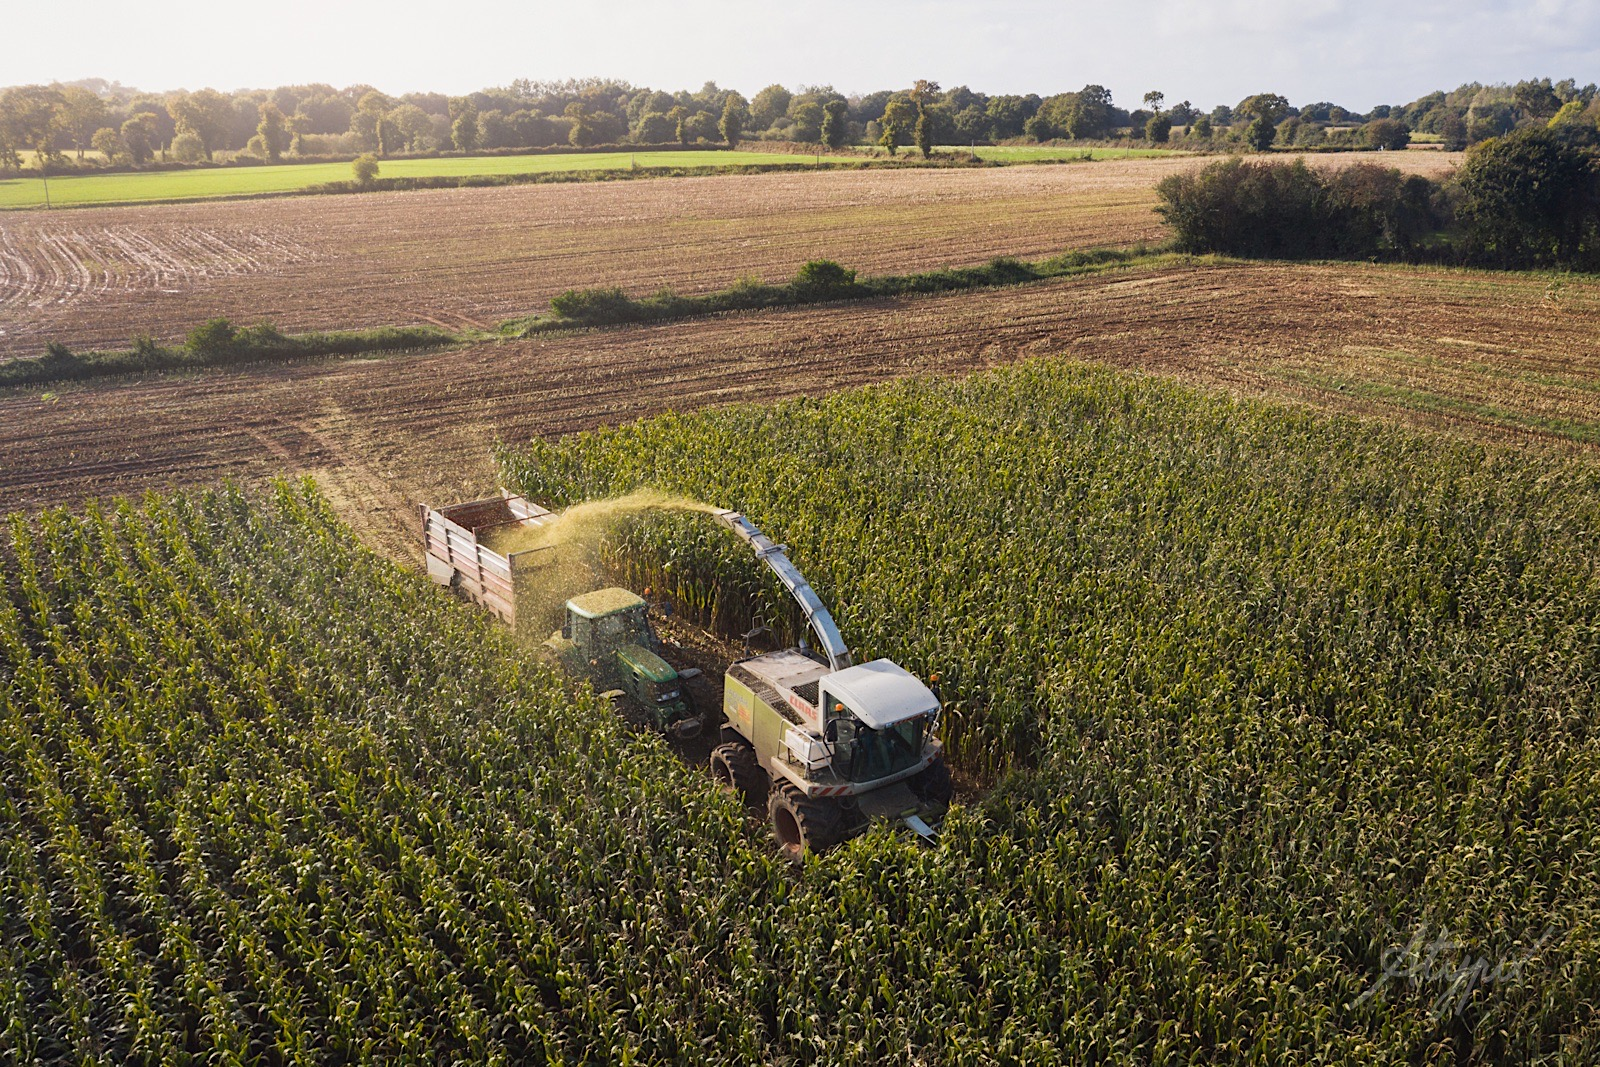 photographe drone agriculture moissonneuse bateuse